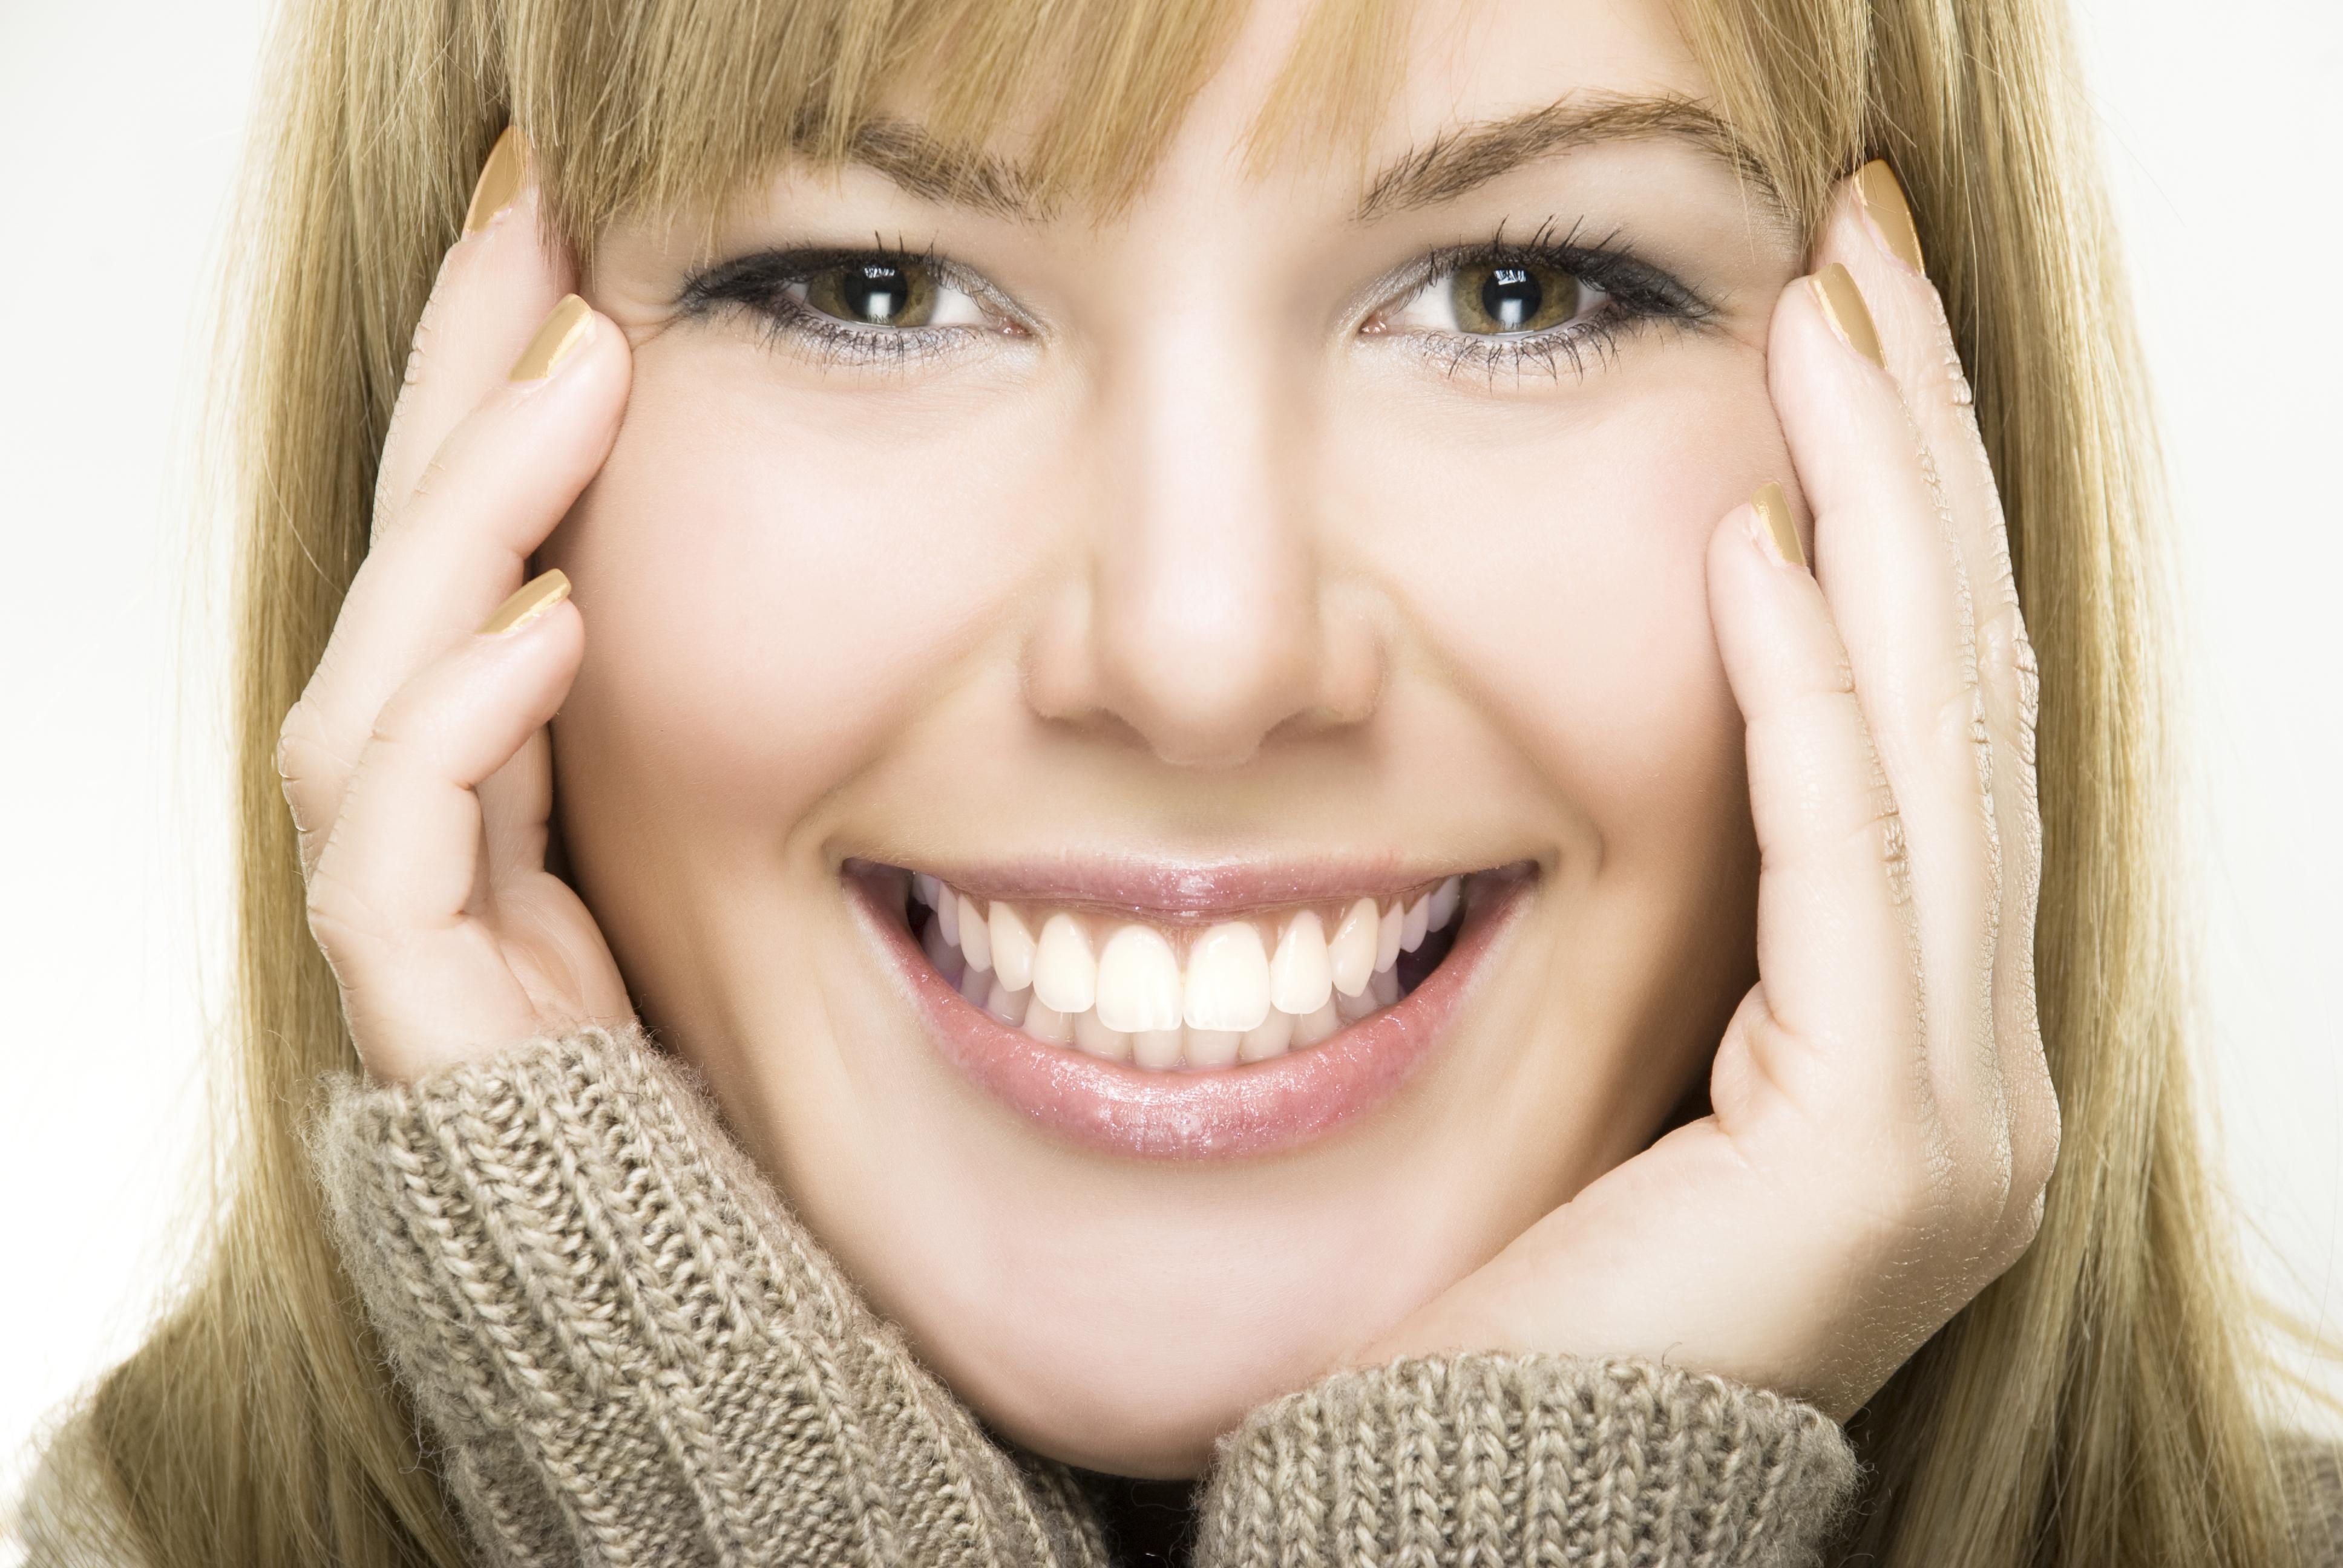 Smile Care Dental and Health Center